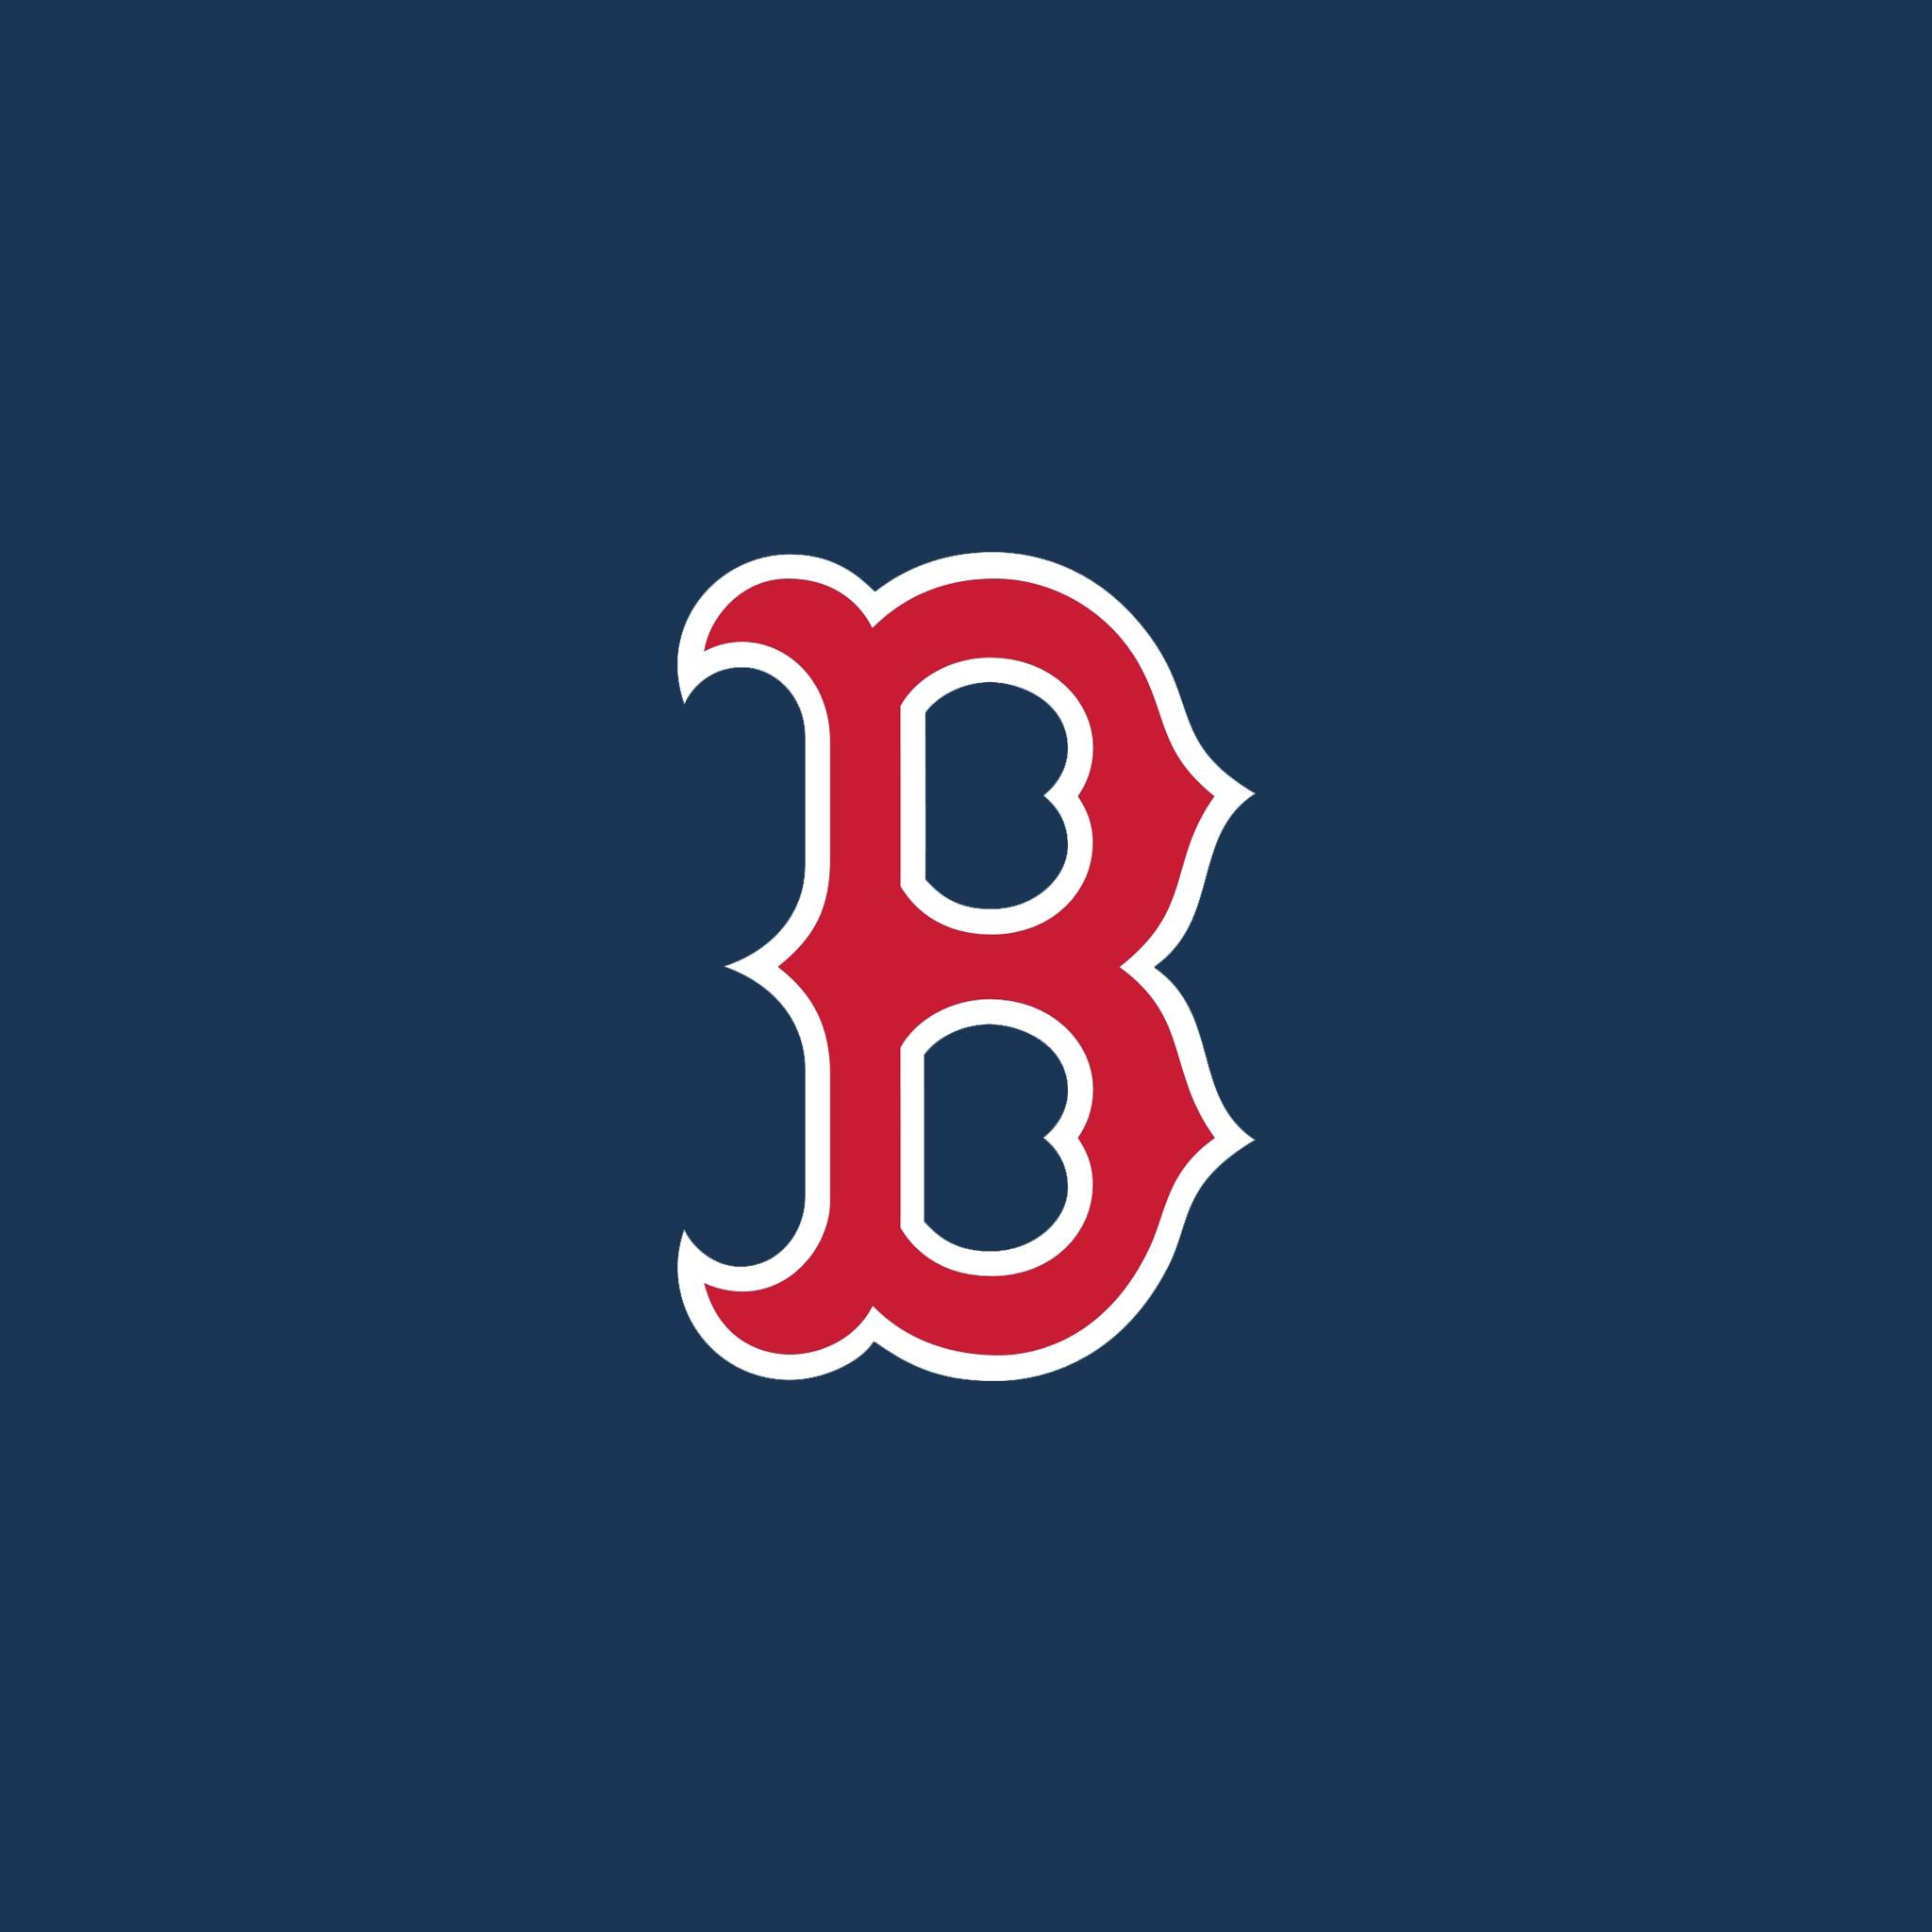 Boston Red Sox B Logo Wallpaper For IPad #6776 | Frenzia.com